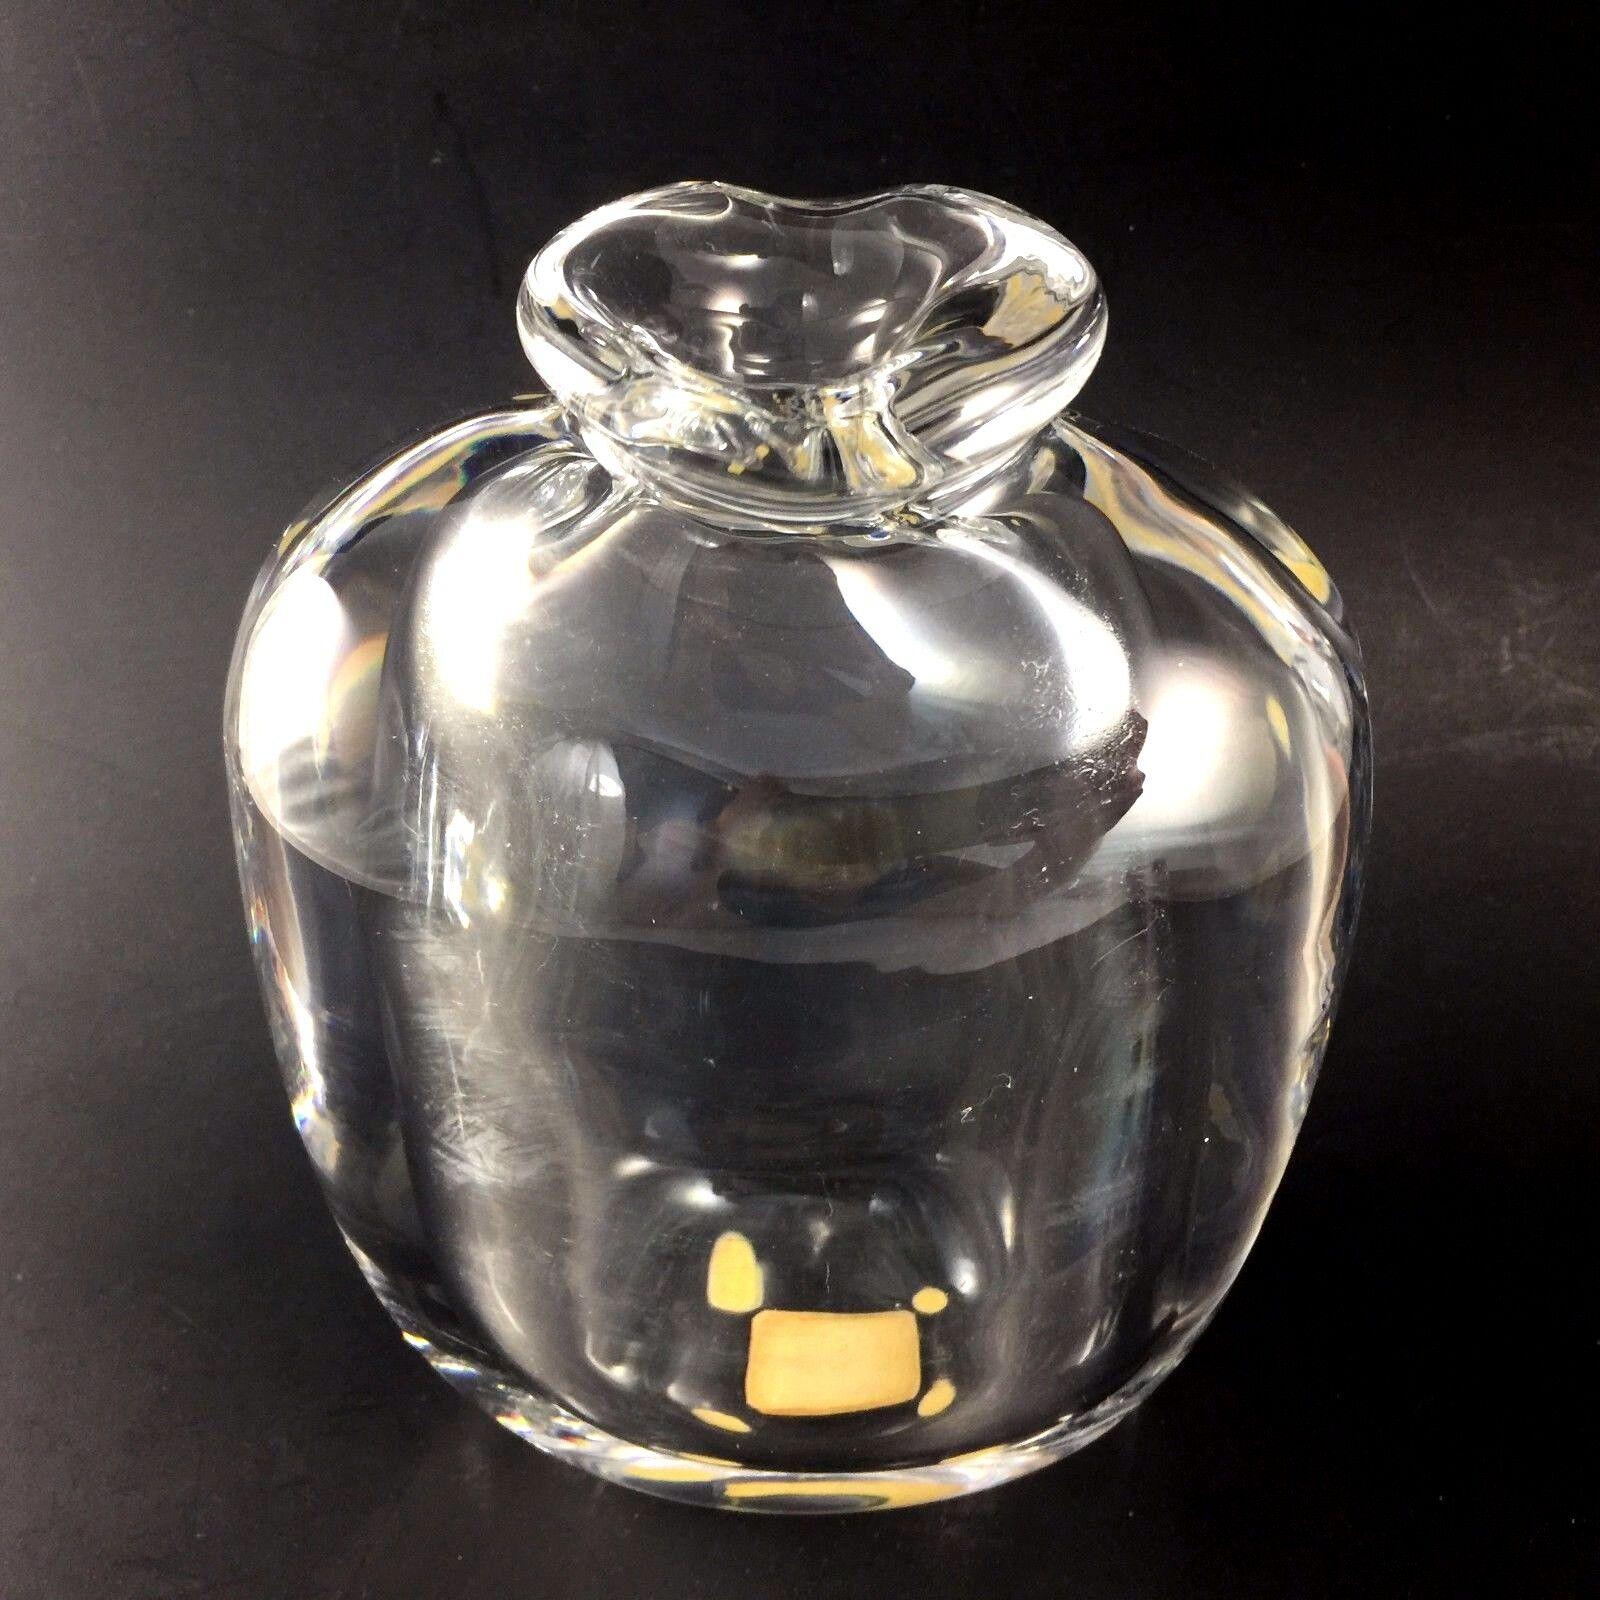 Kosta Boda Crystal Vase Signed Goran Warff Art Glass